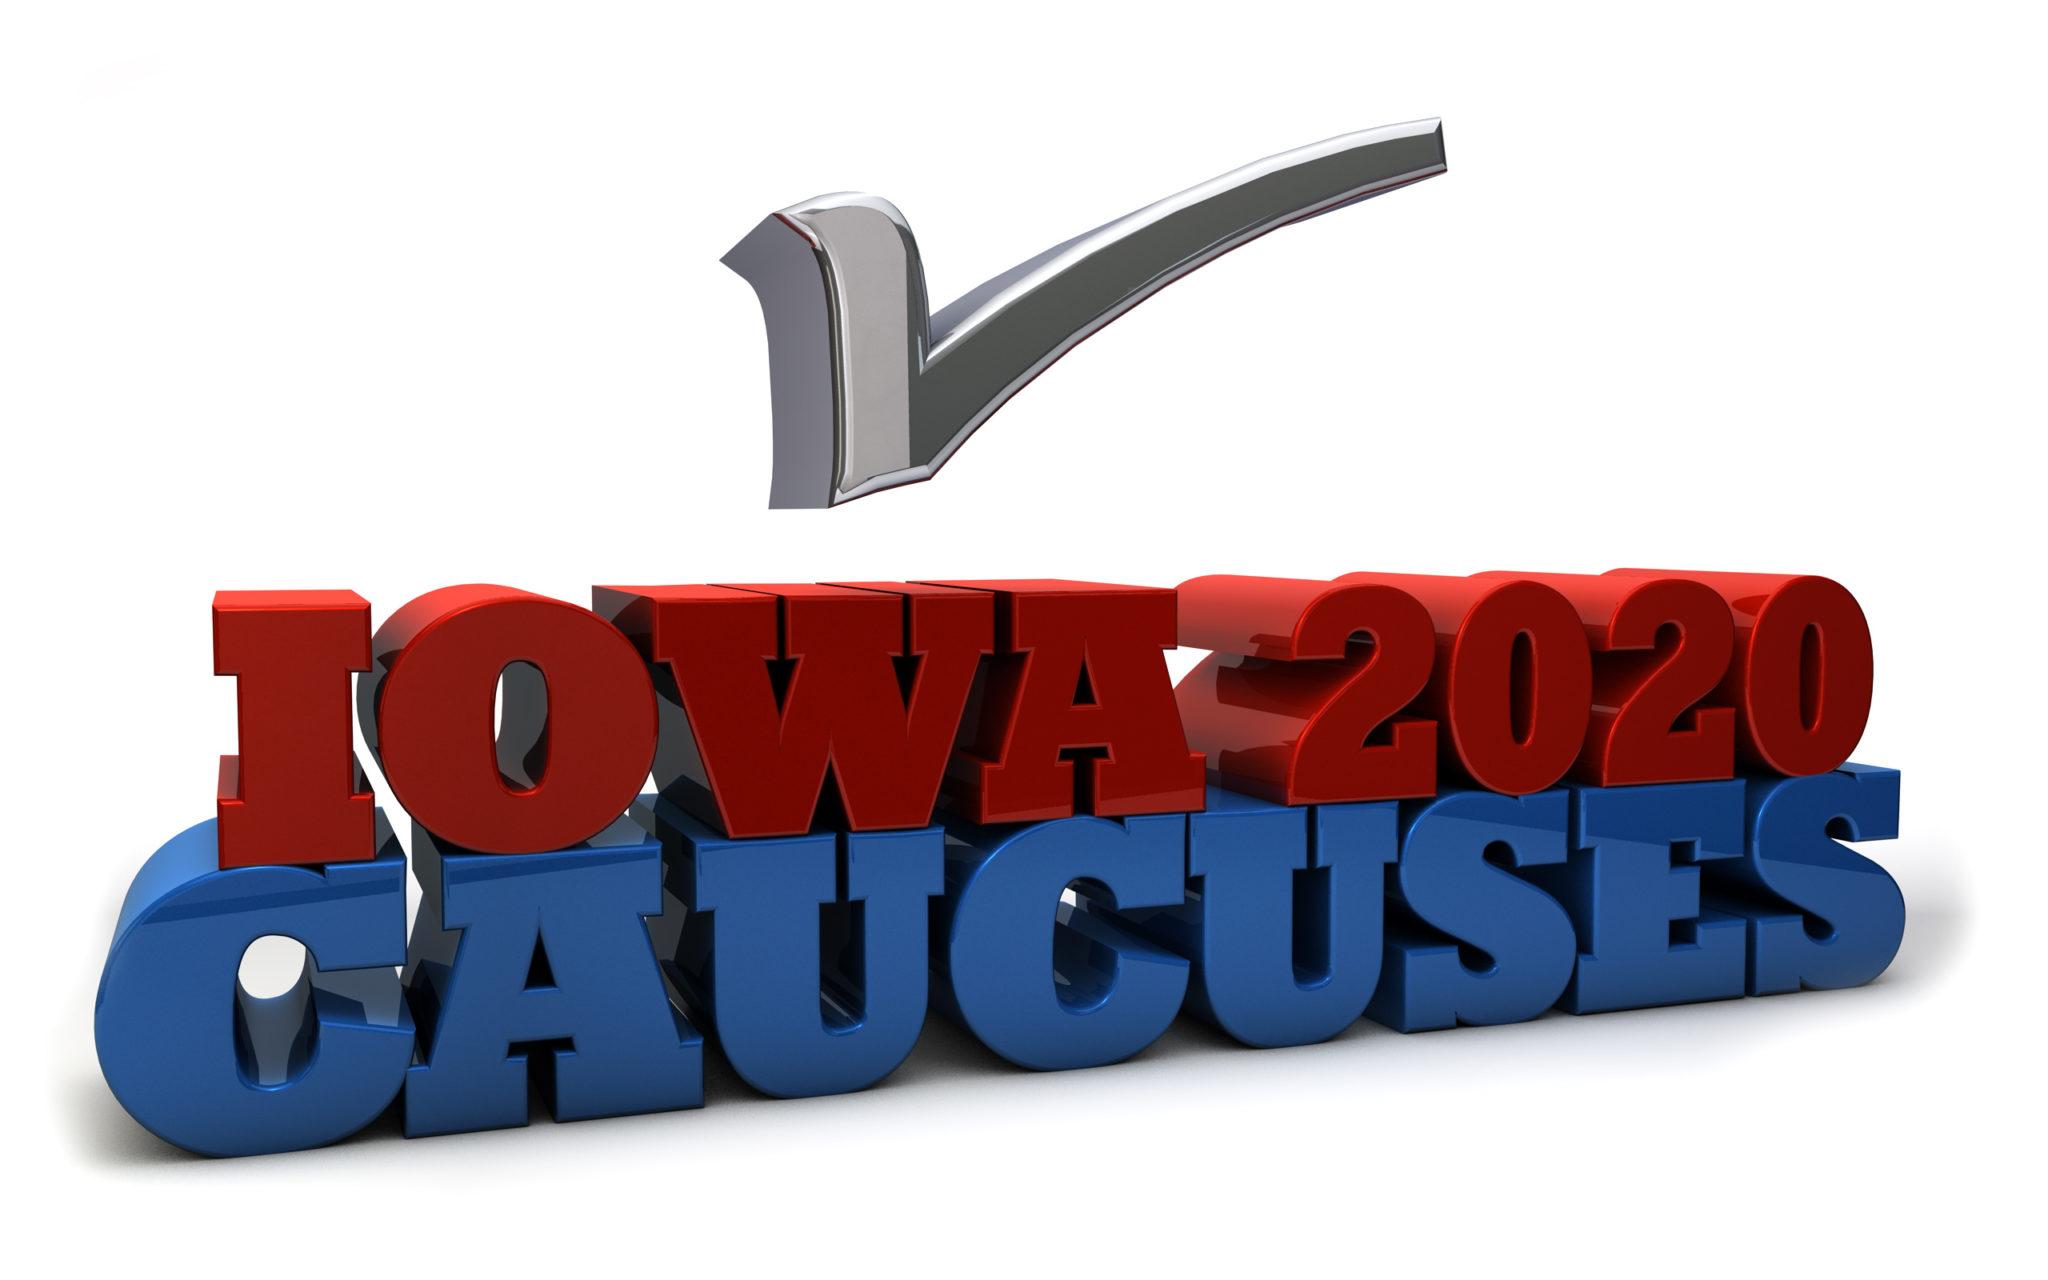 Iowa Caucus fumble Blamed on App Data